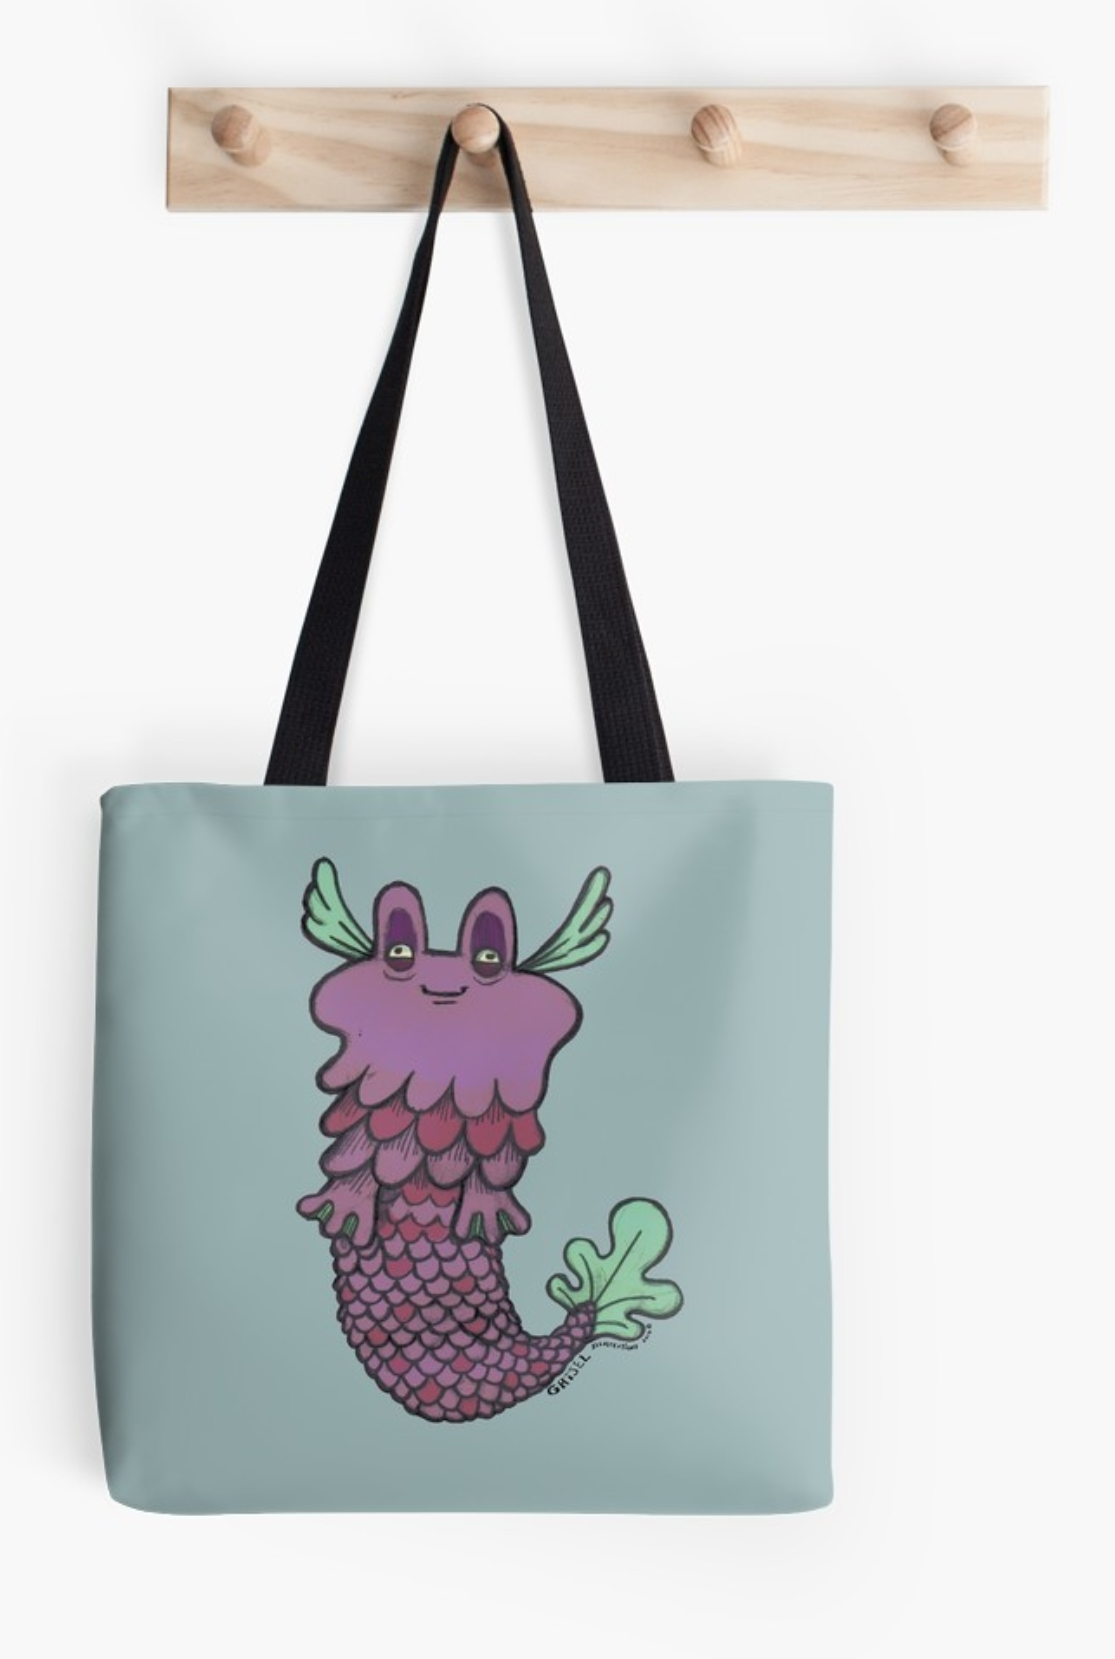 Purple Eddie Tote Bag